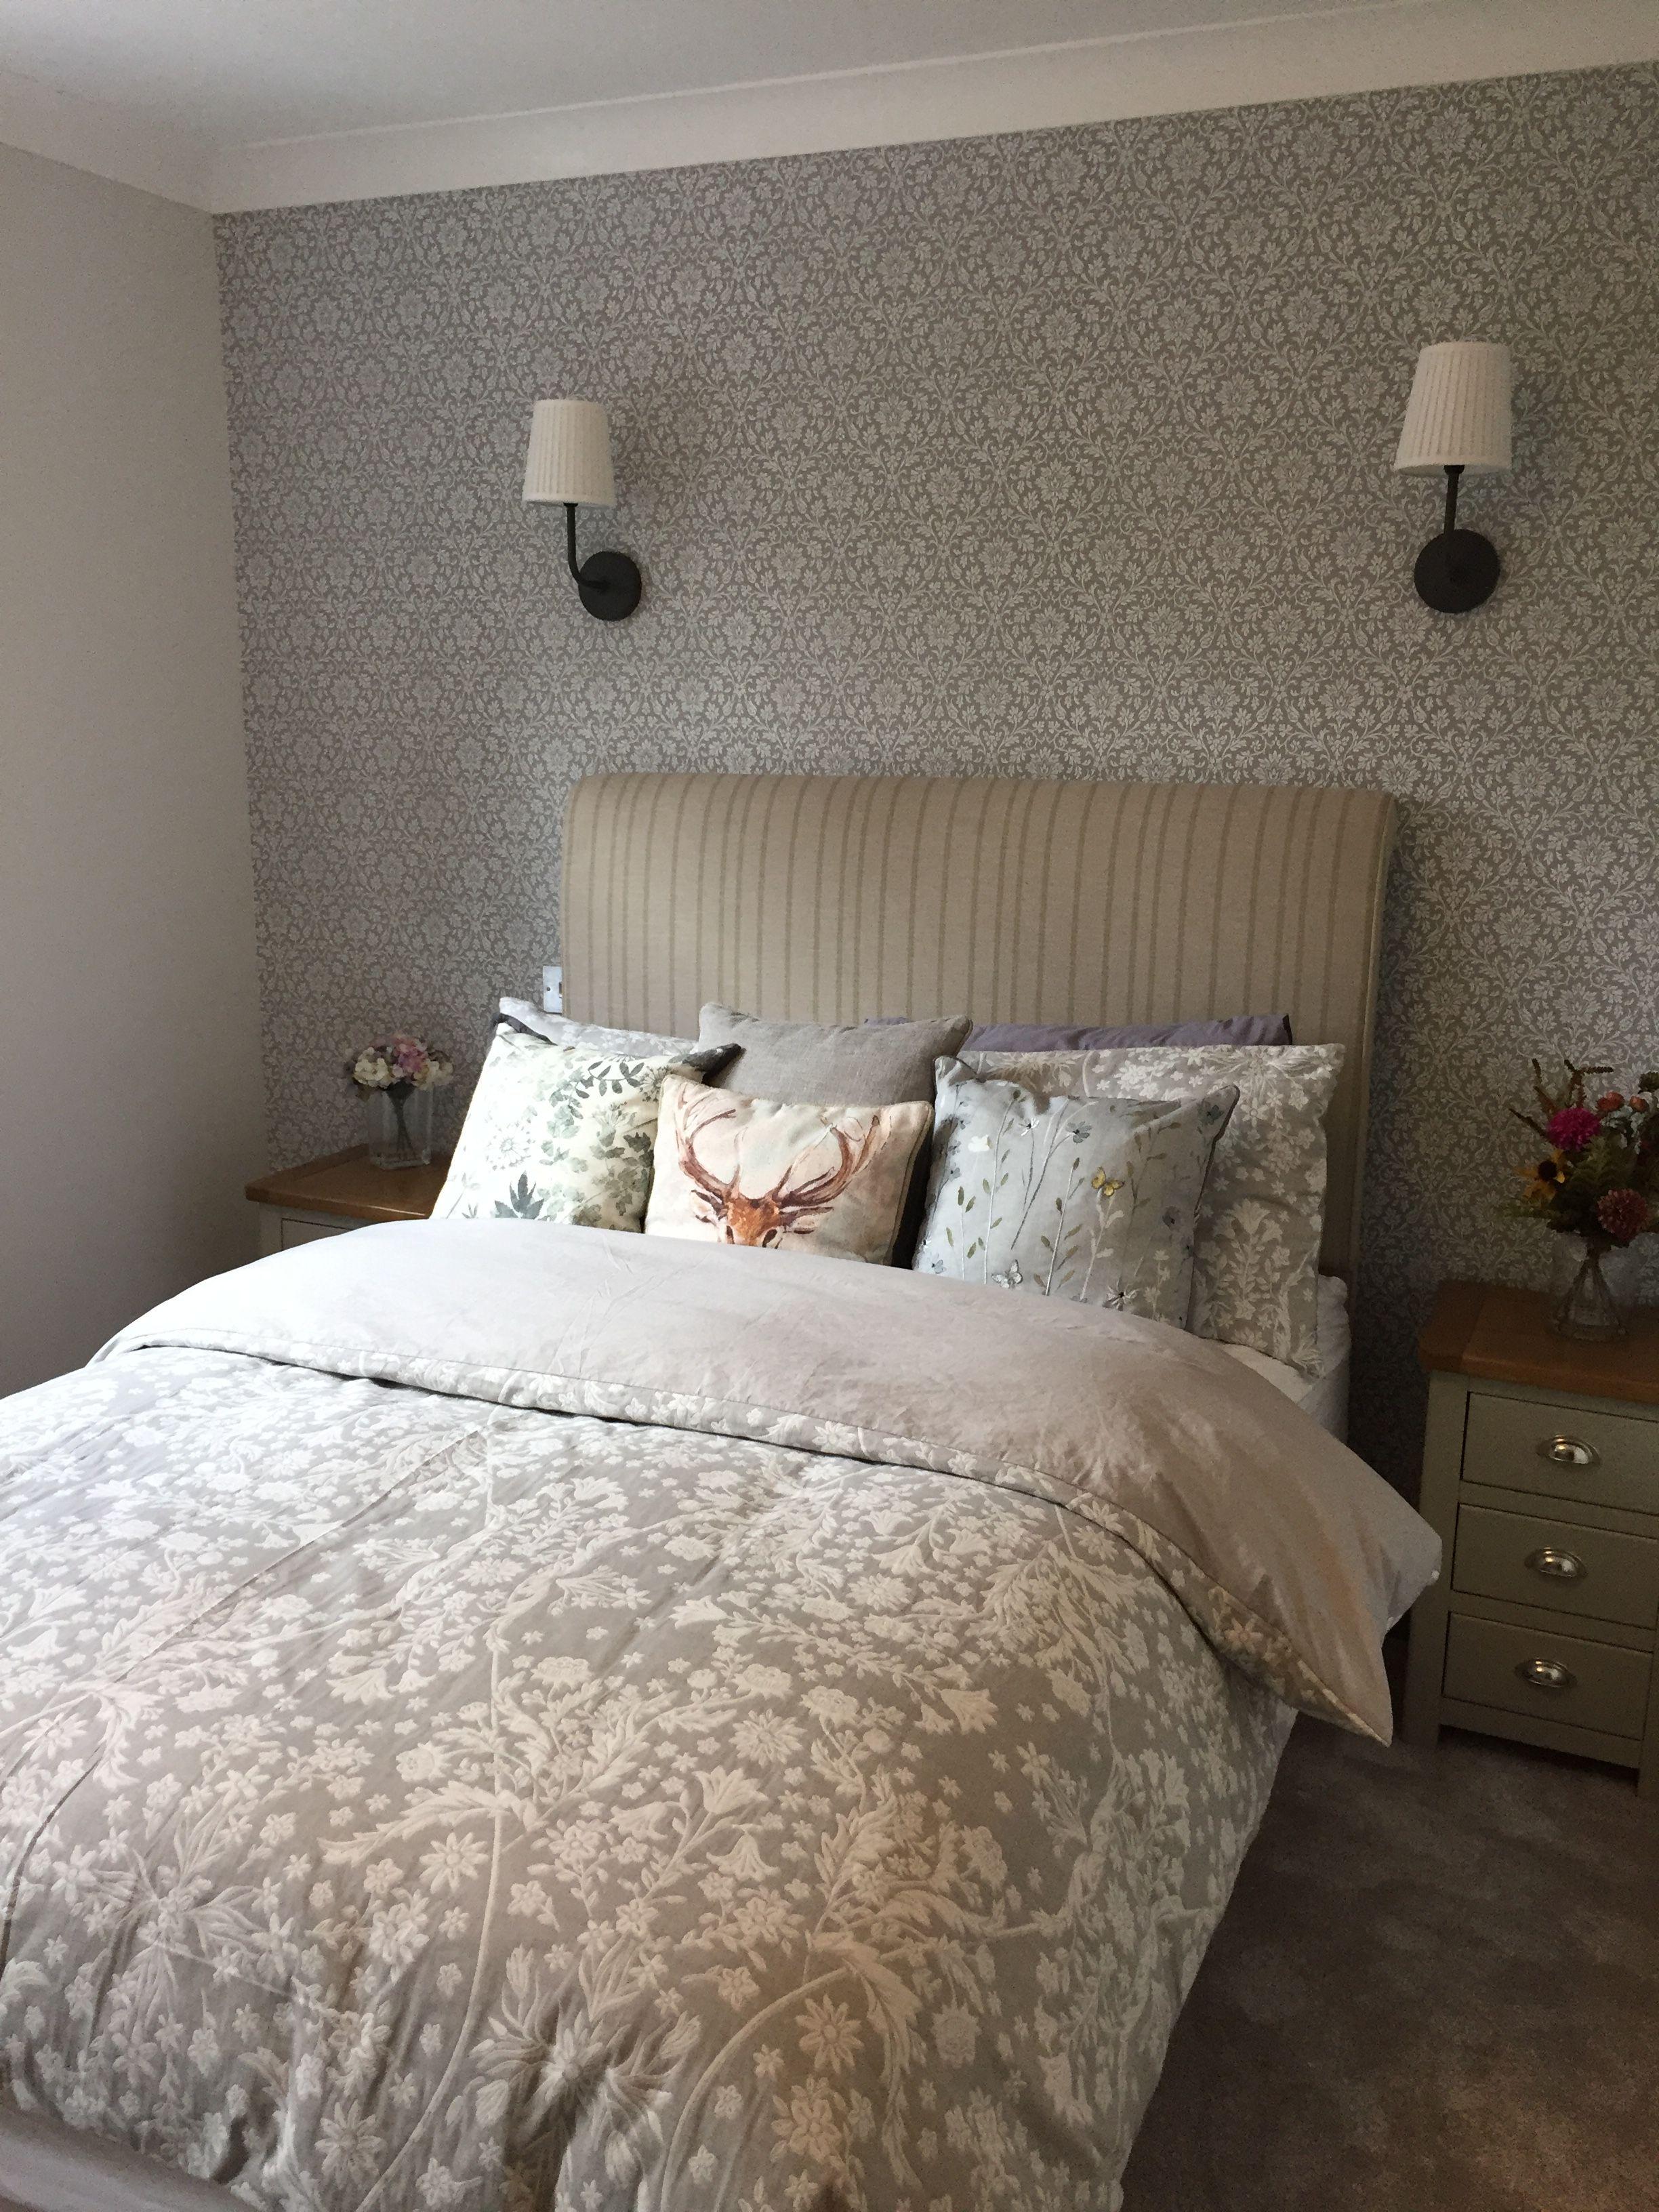 Guest room Laura Ashley annecy wallpaper Ikea wall light Neptune